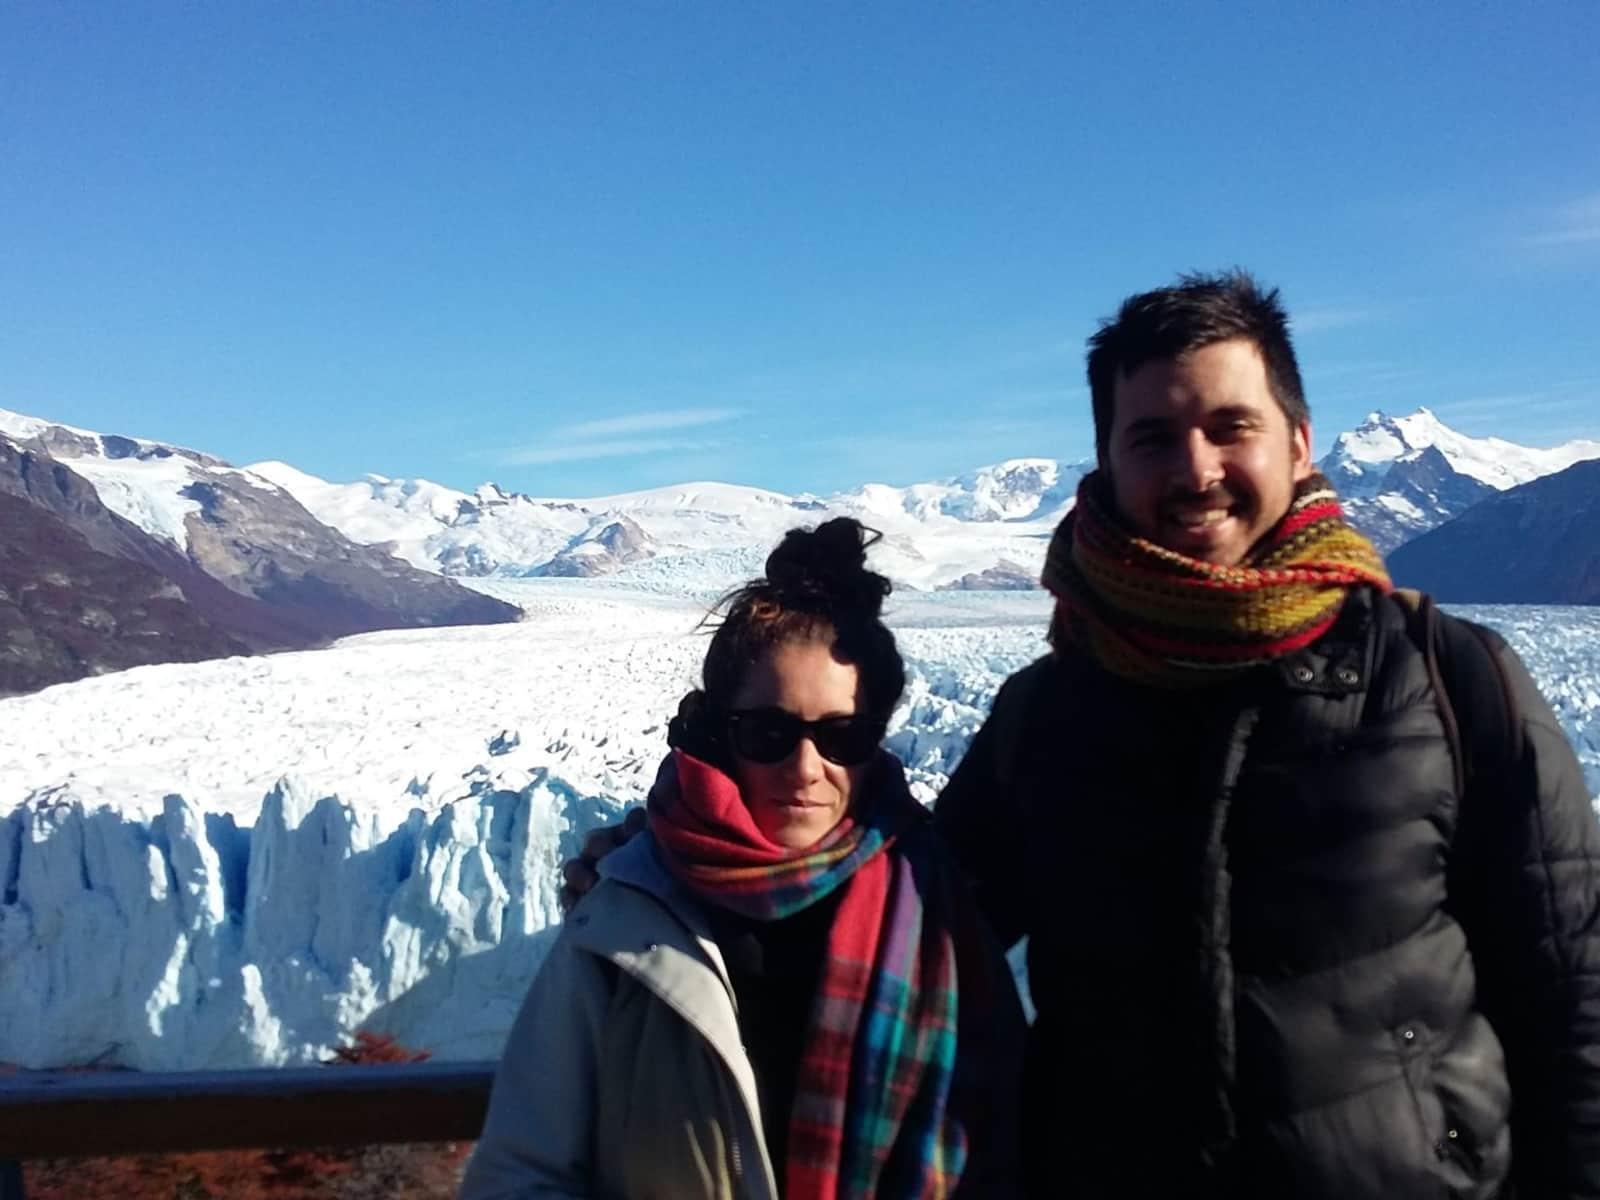 Marcelo & Lourdes from Olivos, Argentina